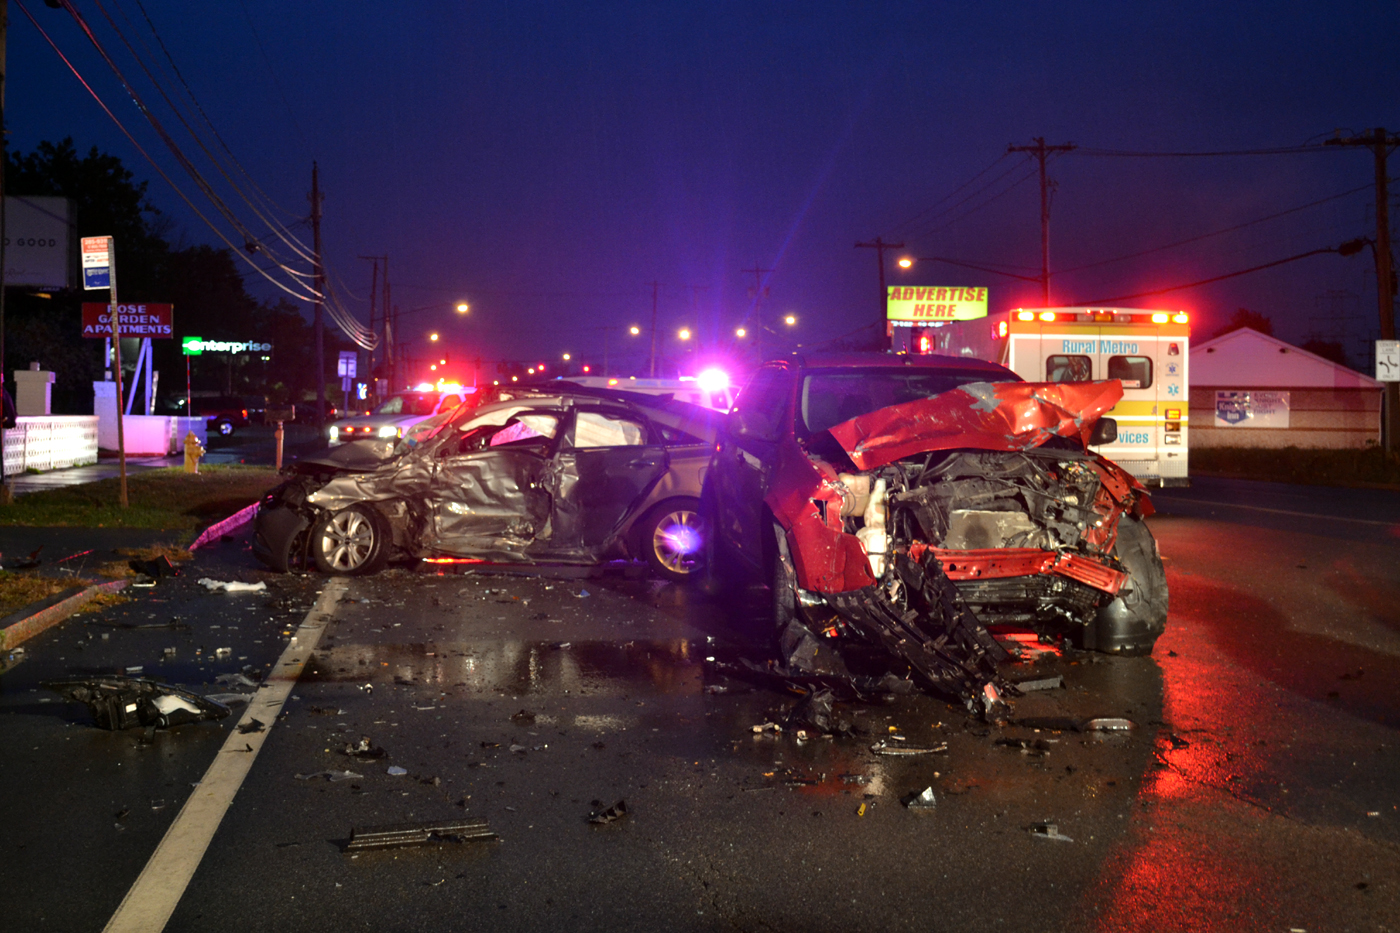 The scene of a fatal crash in Niagara Falls. (Larry Kensinger/contributor)